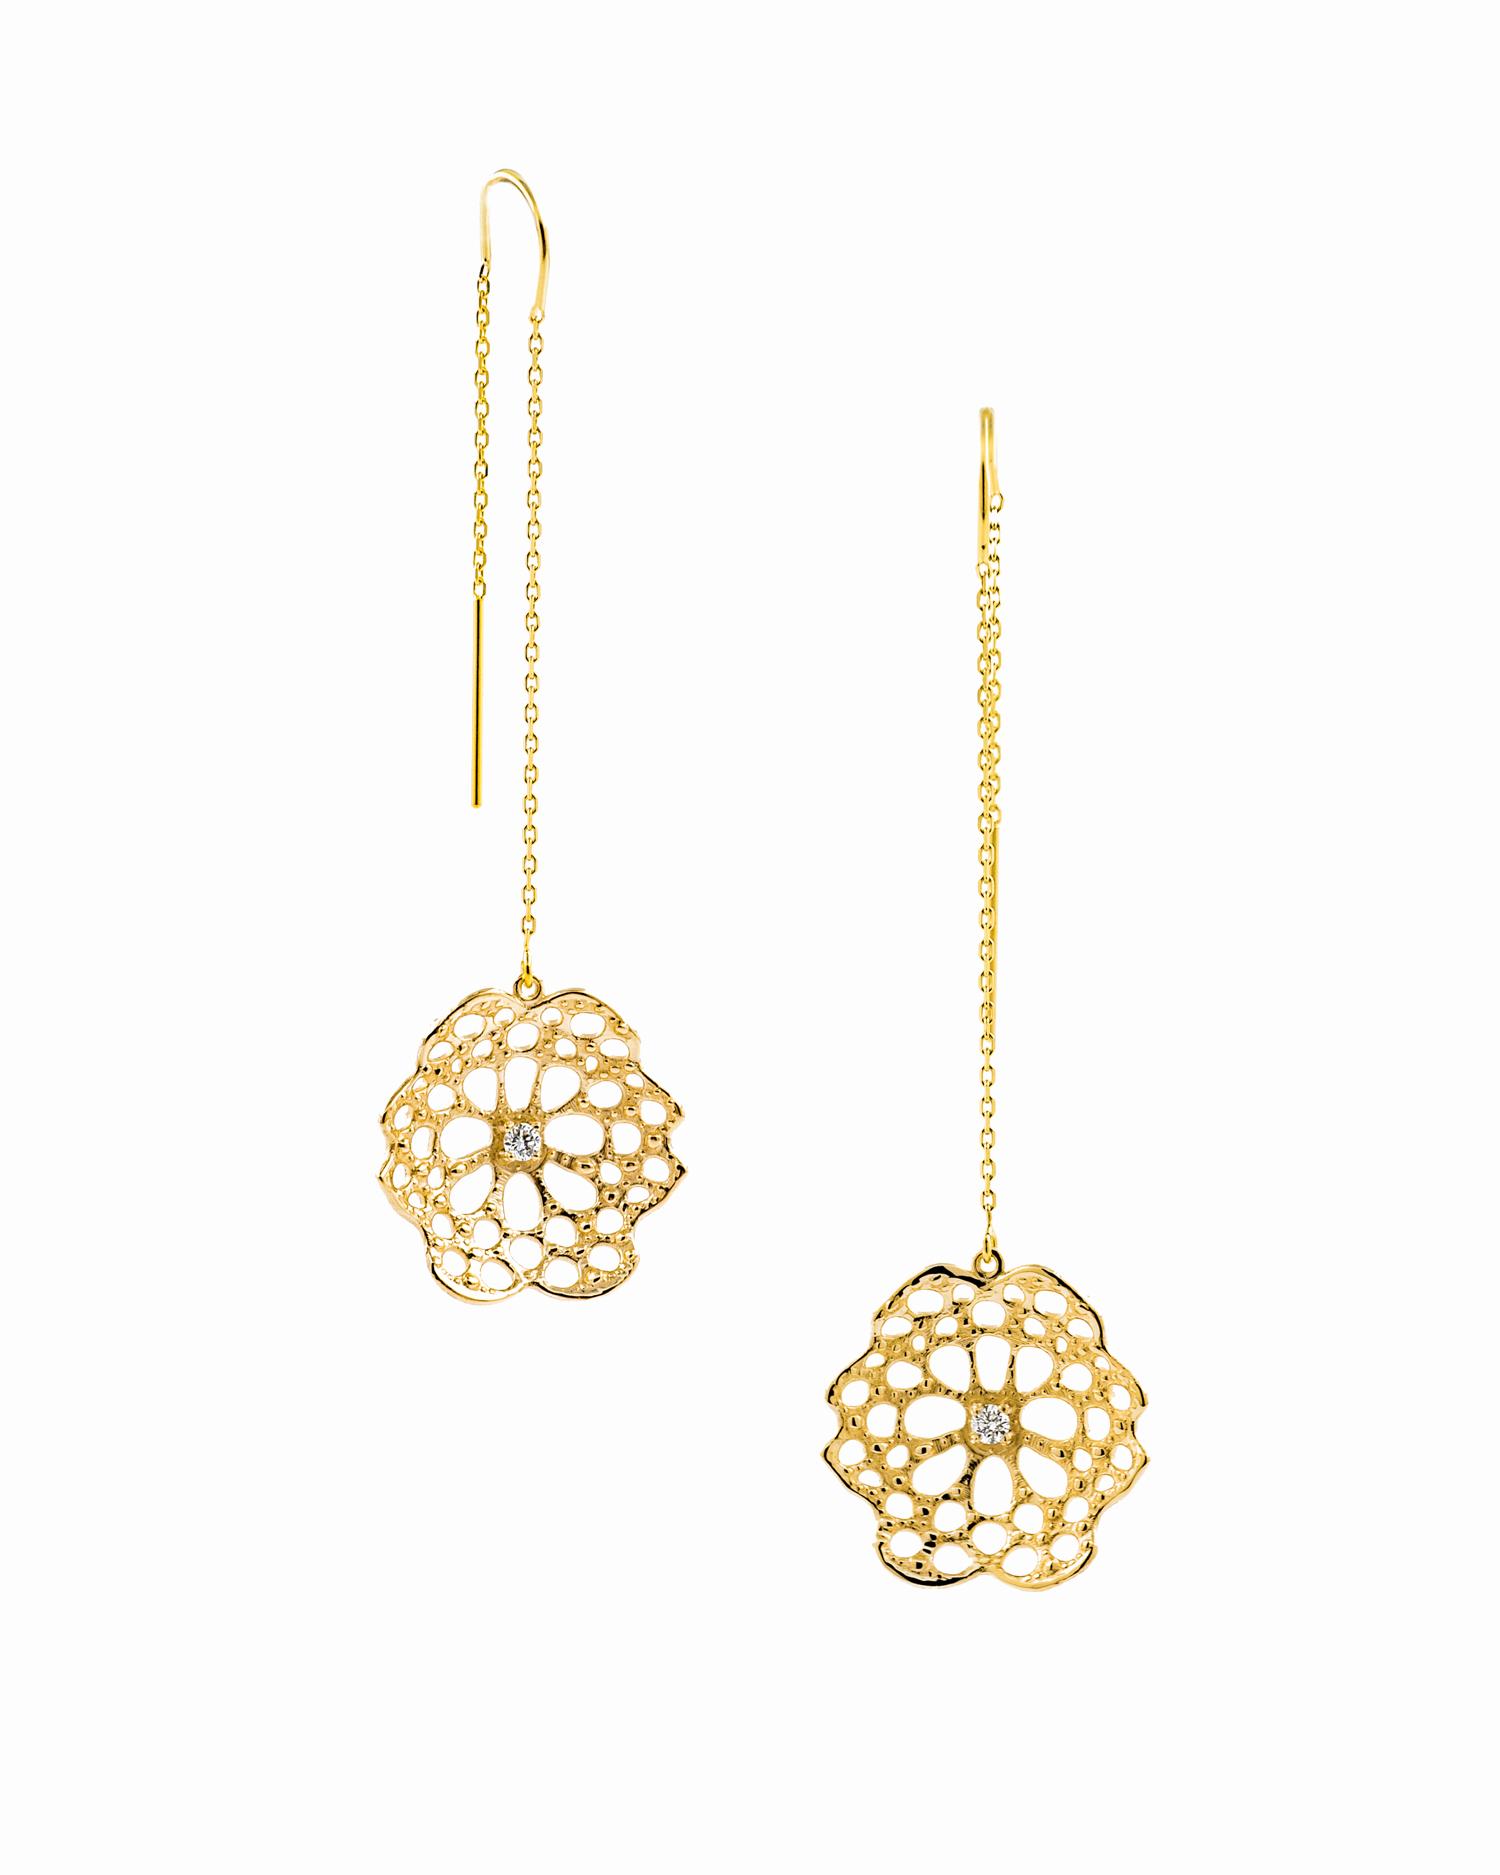 Threaded radial earrings |  14ct yellow gold, white diamonds.